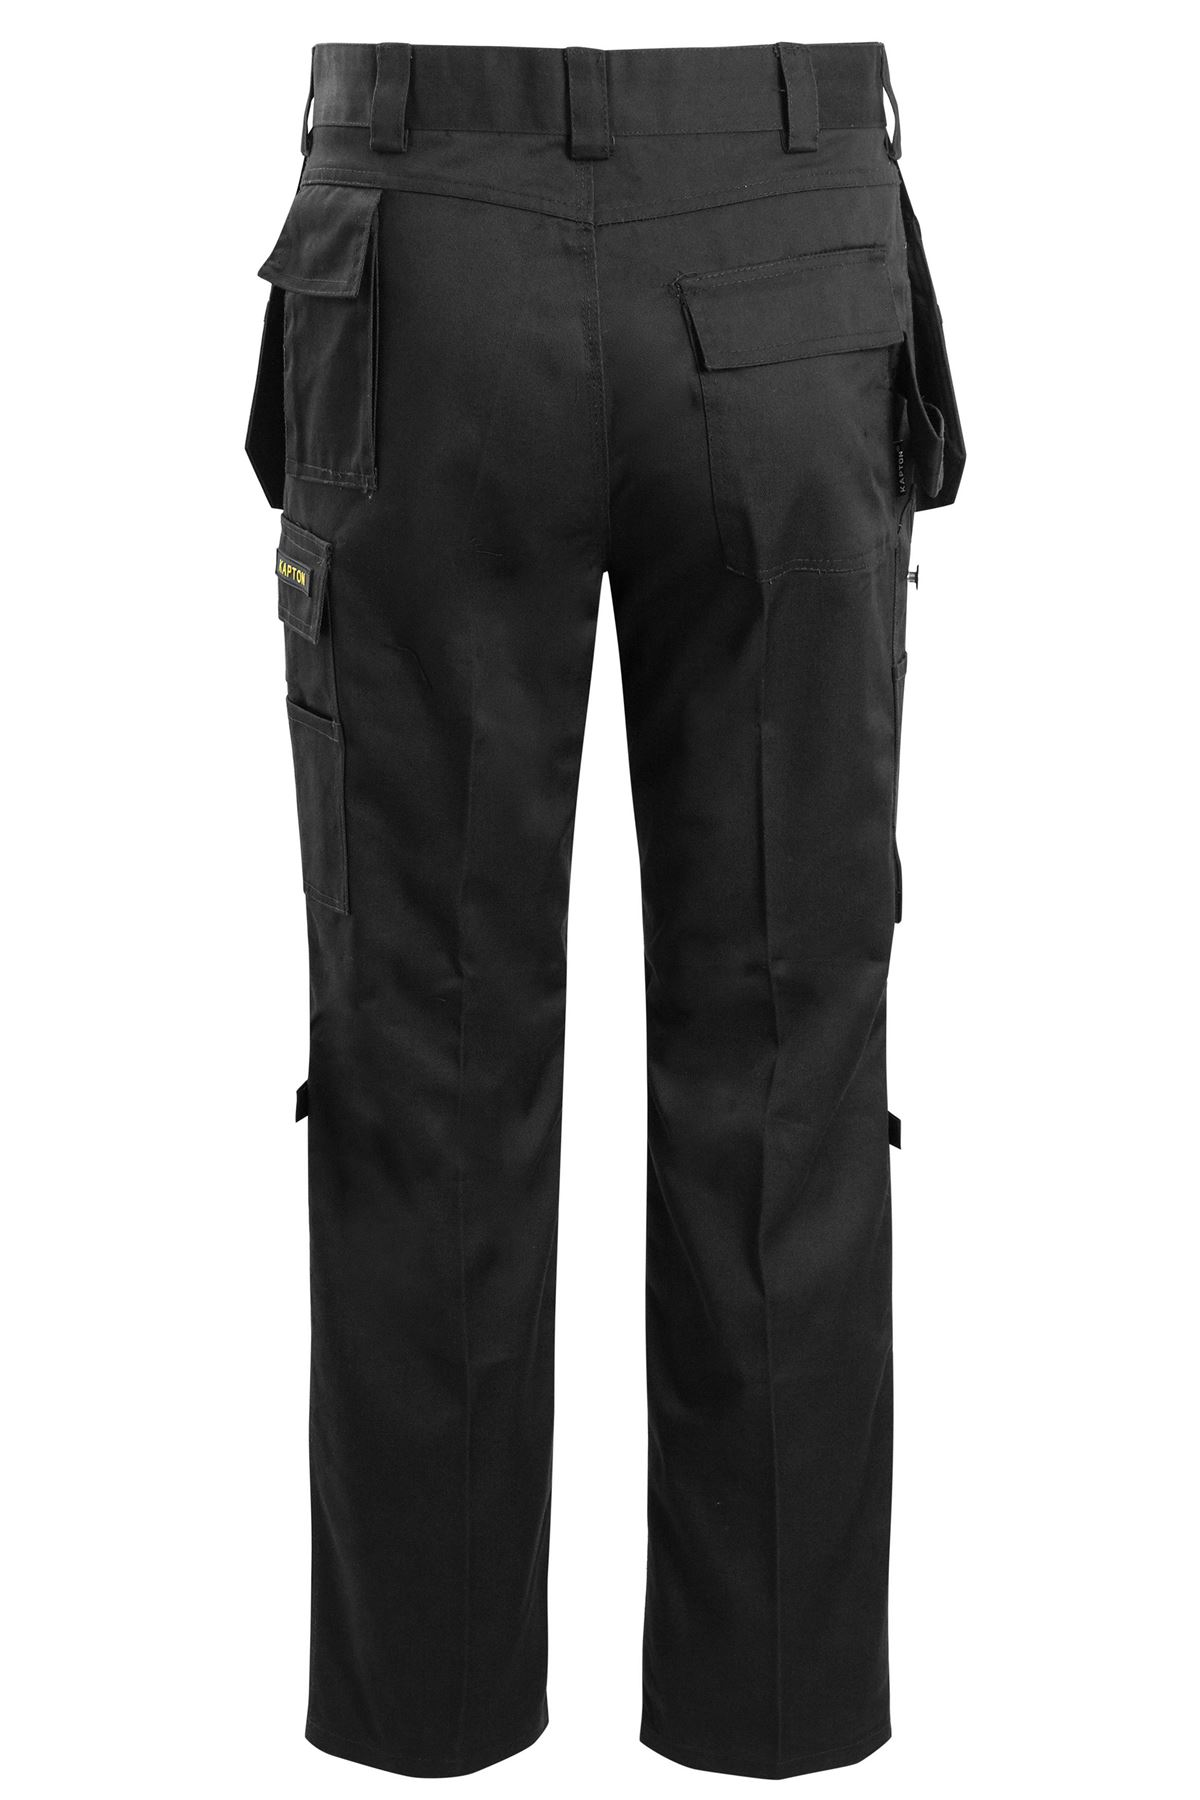 Mens Waterproof Knee Pad Hiking Pants Cargo Combat Trousers Bottoms Casual Work